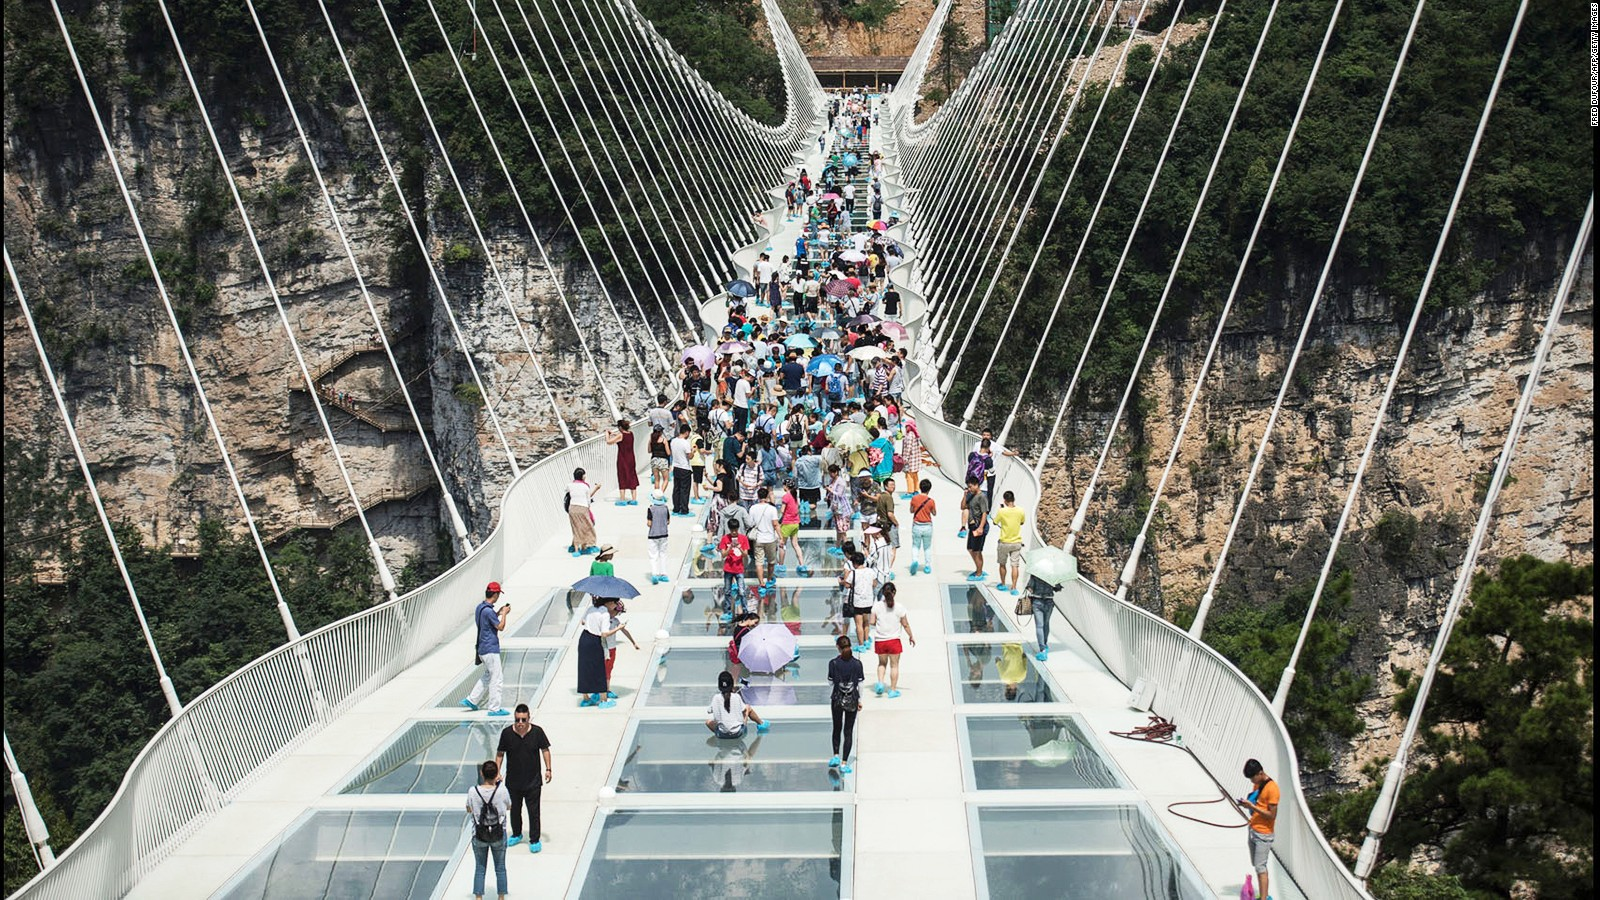 Hongyagu glass bridge, world's longest, opens in Hebei